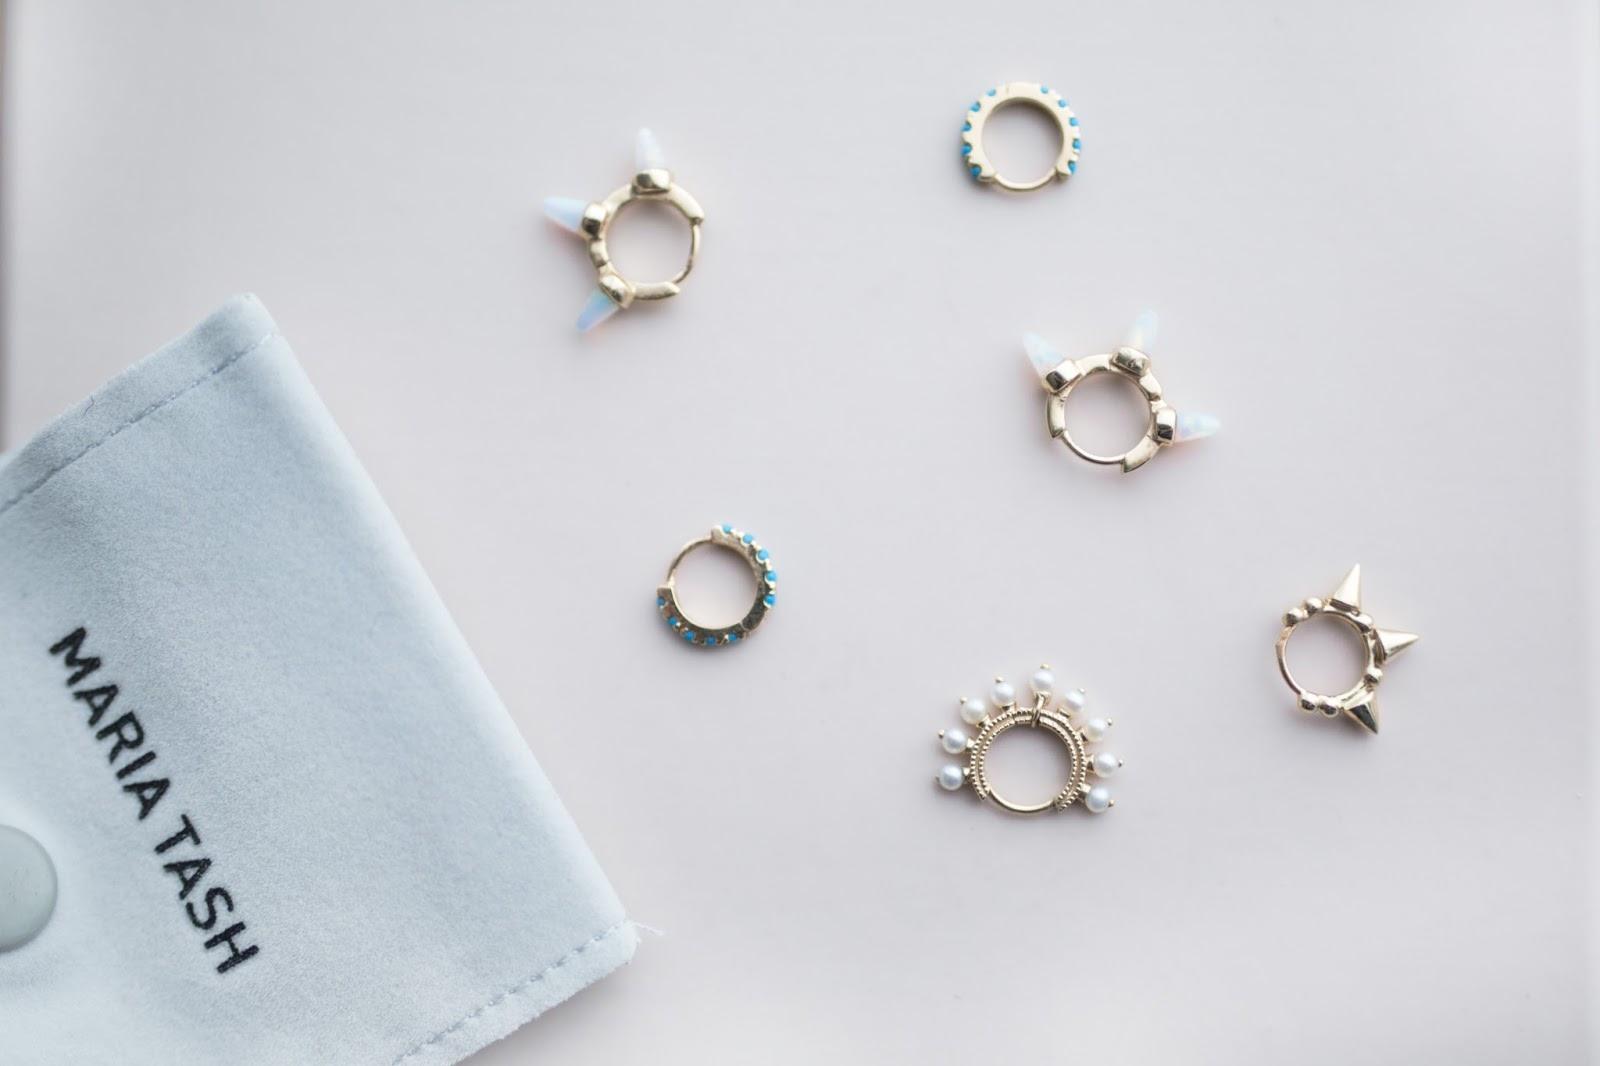 Jewelry || The Maria Tash Addiction